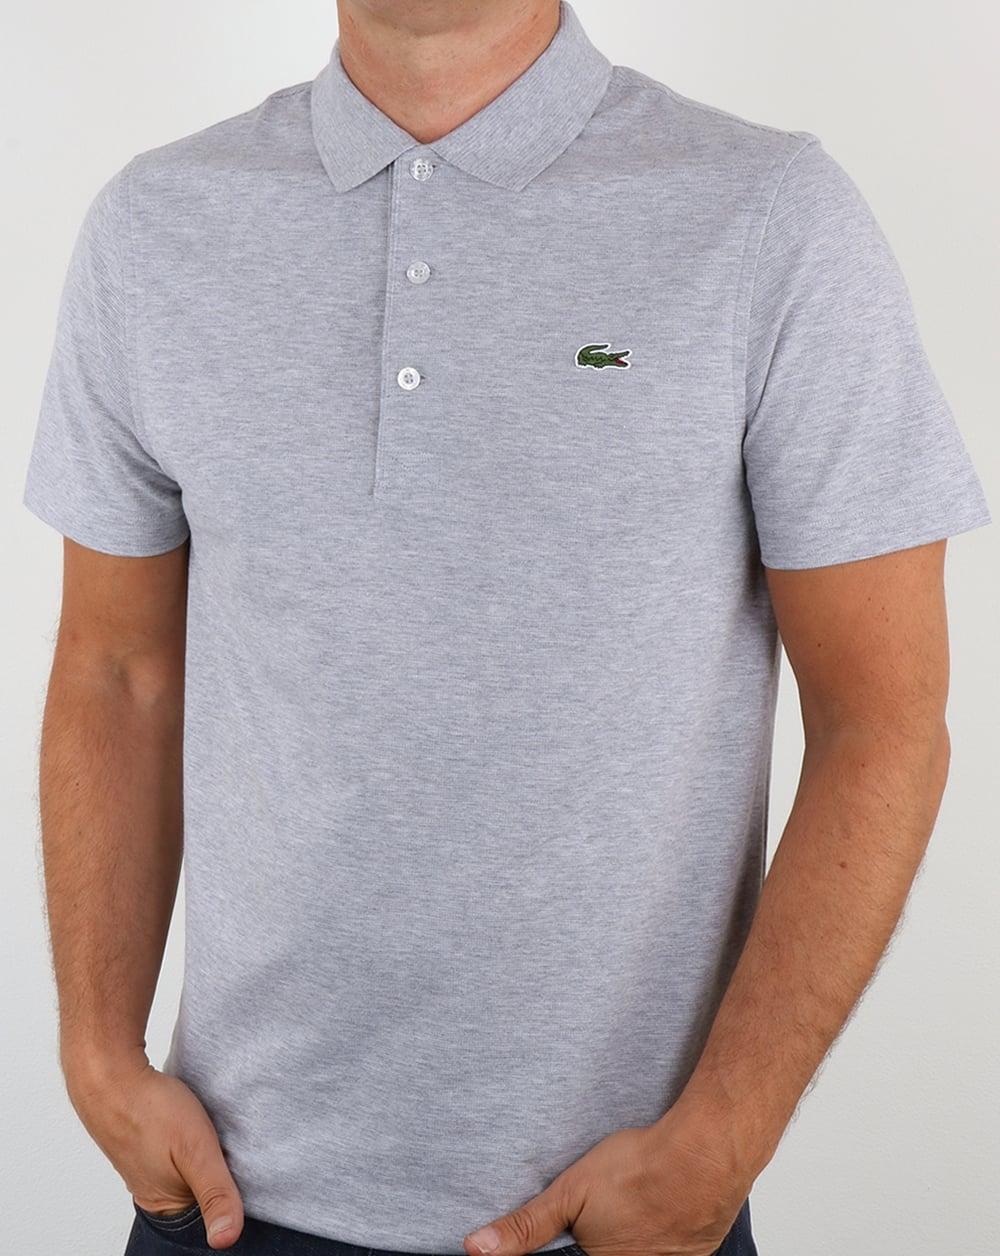 df56c81c3 Lacoste lightweight Knit Polo Shirt Silver grey